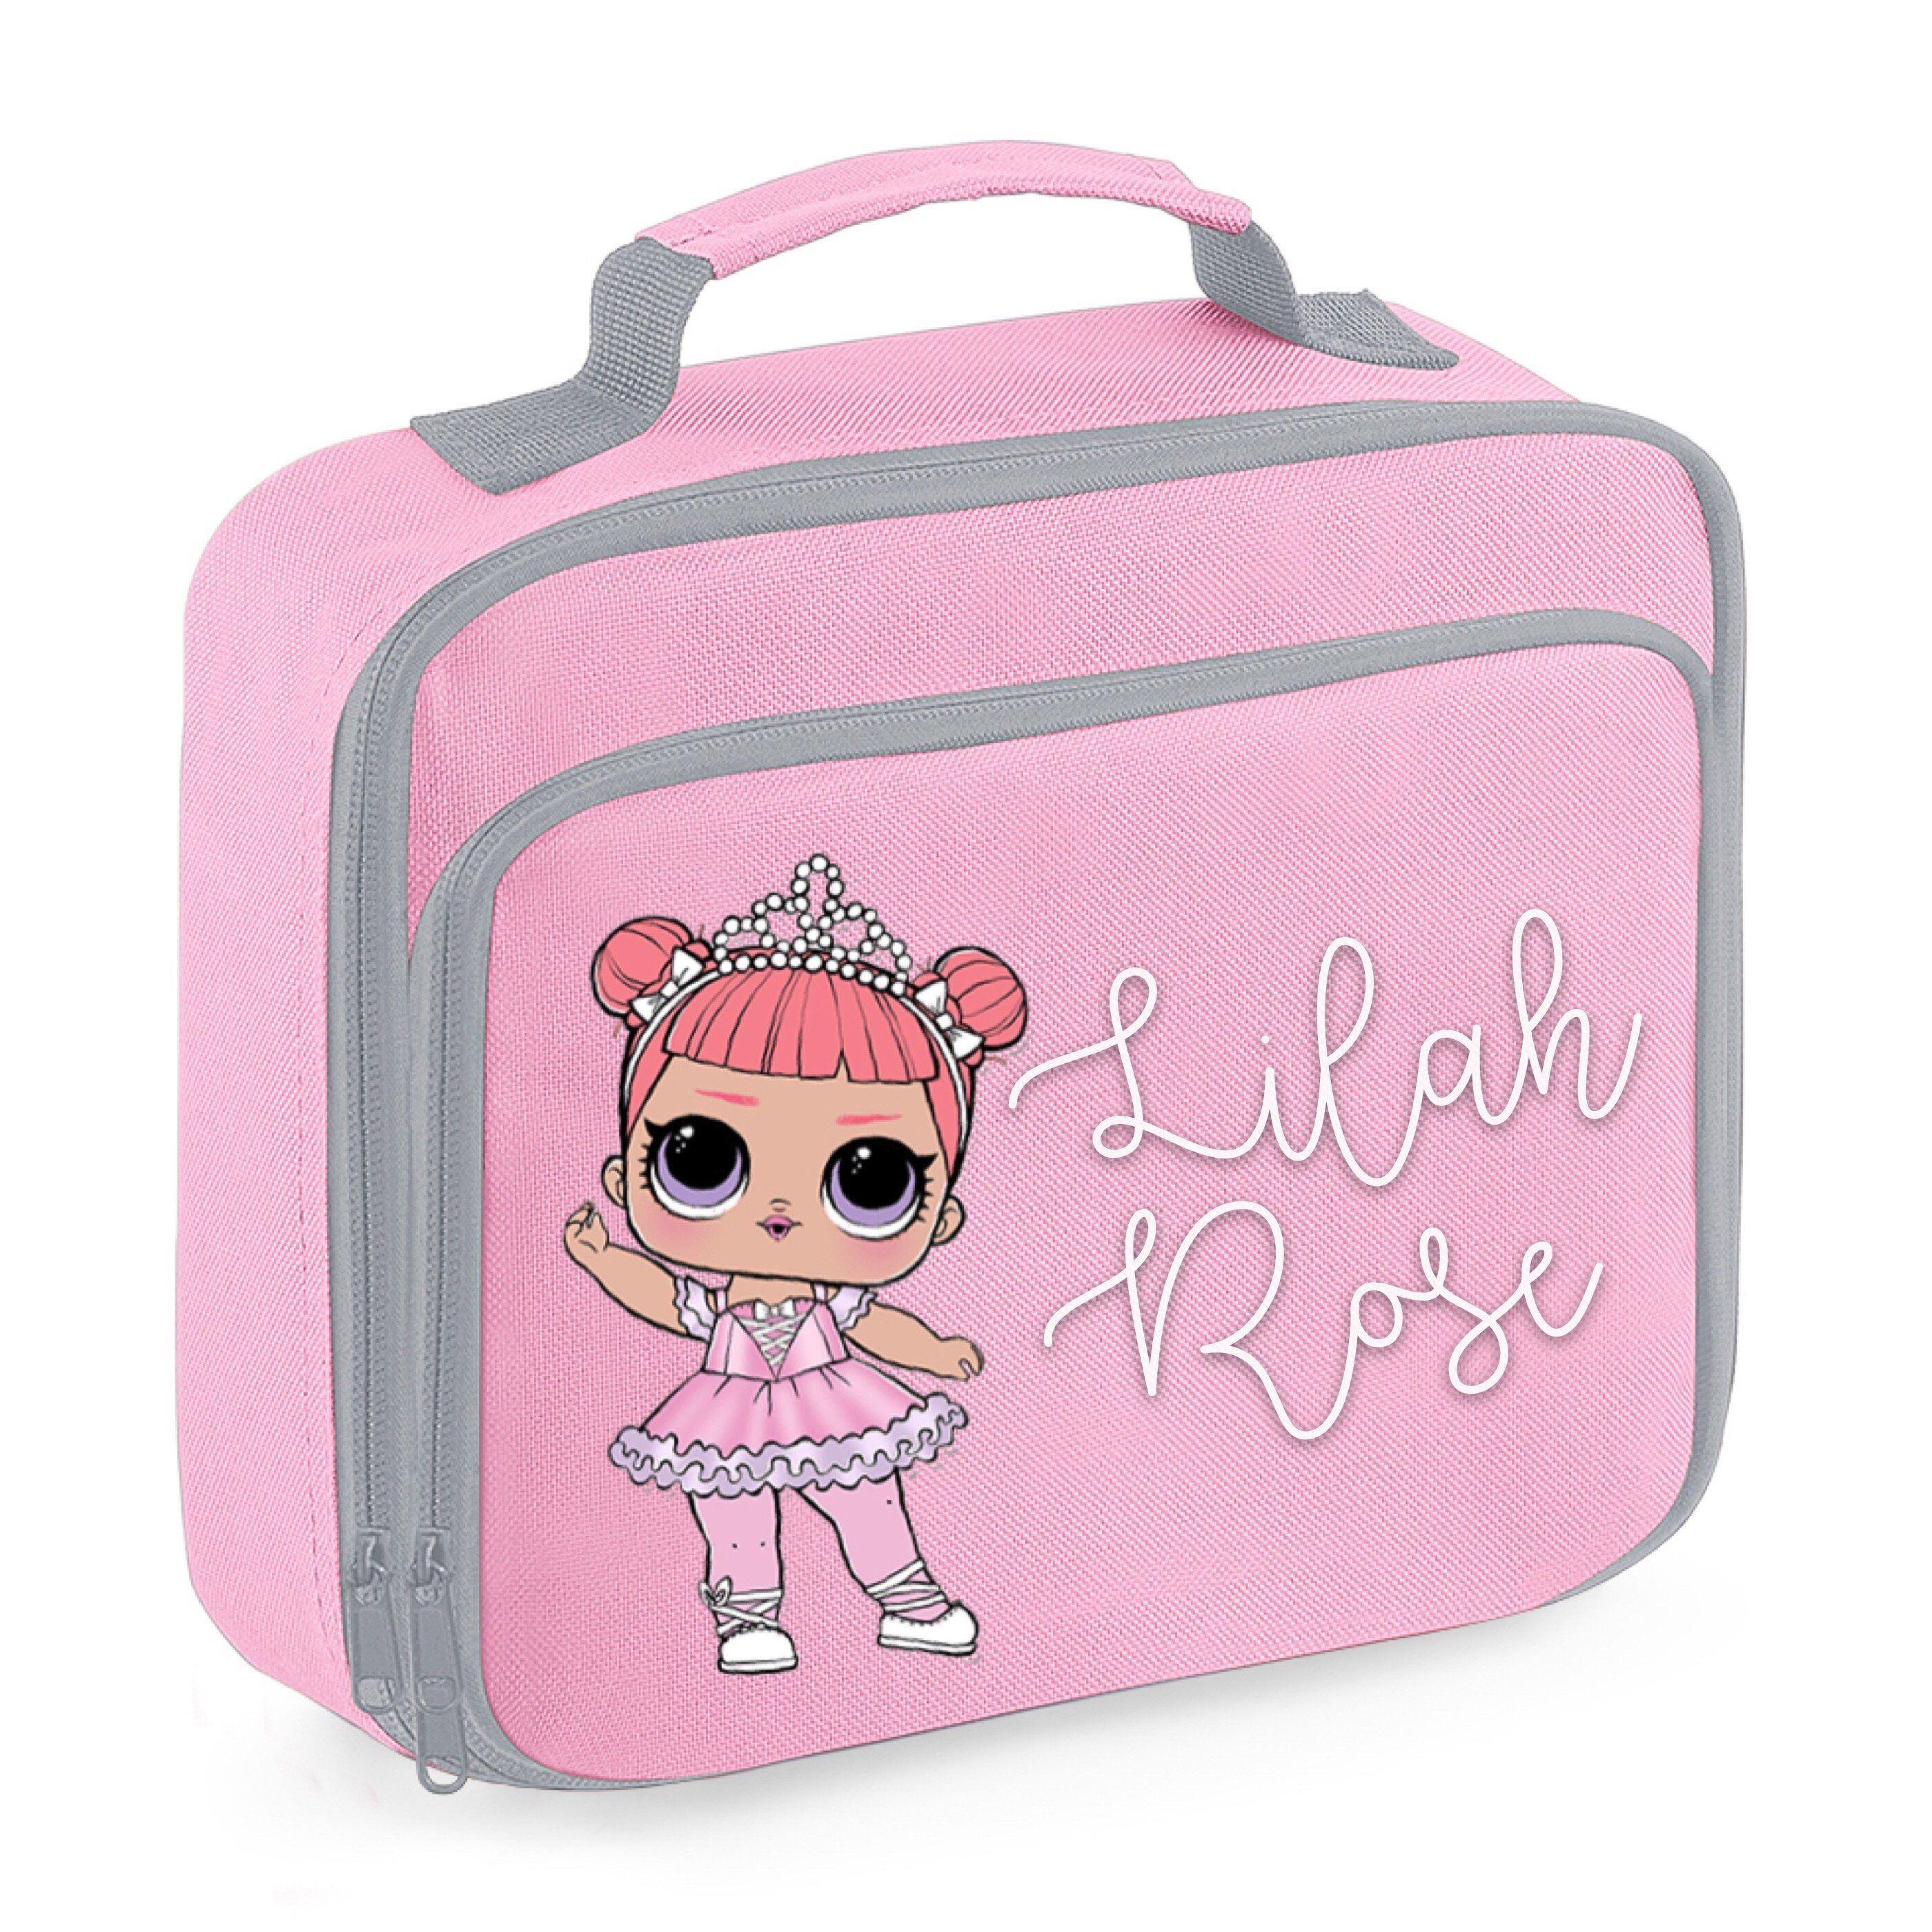 LOL doll Personalised Bag Gift